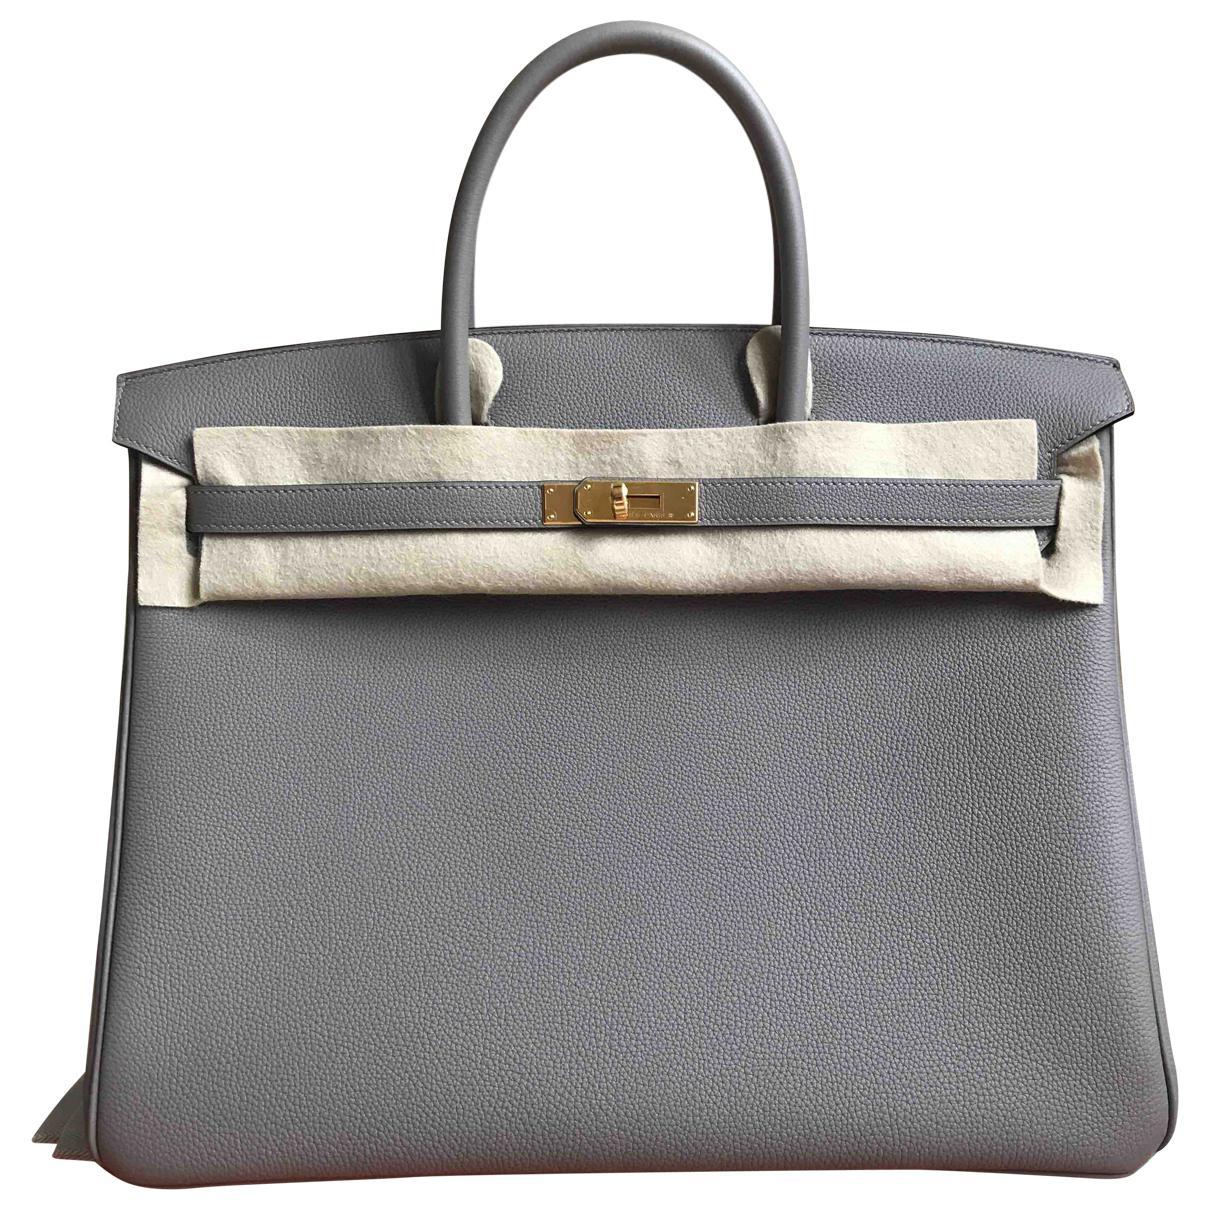 fd820aa889 Hermès Preowned Birkin 40 leather handbag ZbnJ7Lj5 - zanarasabina.com